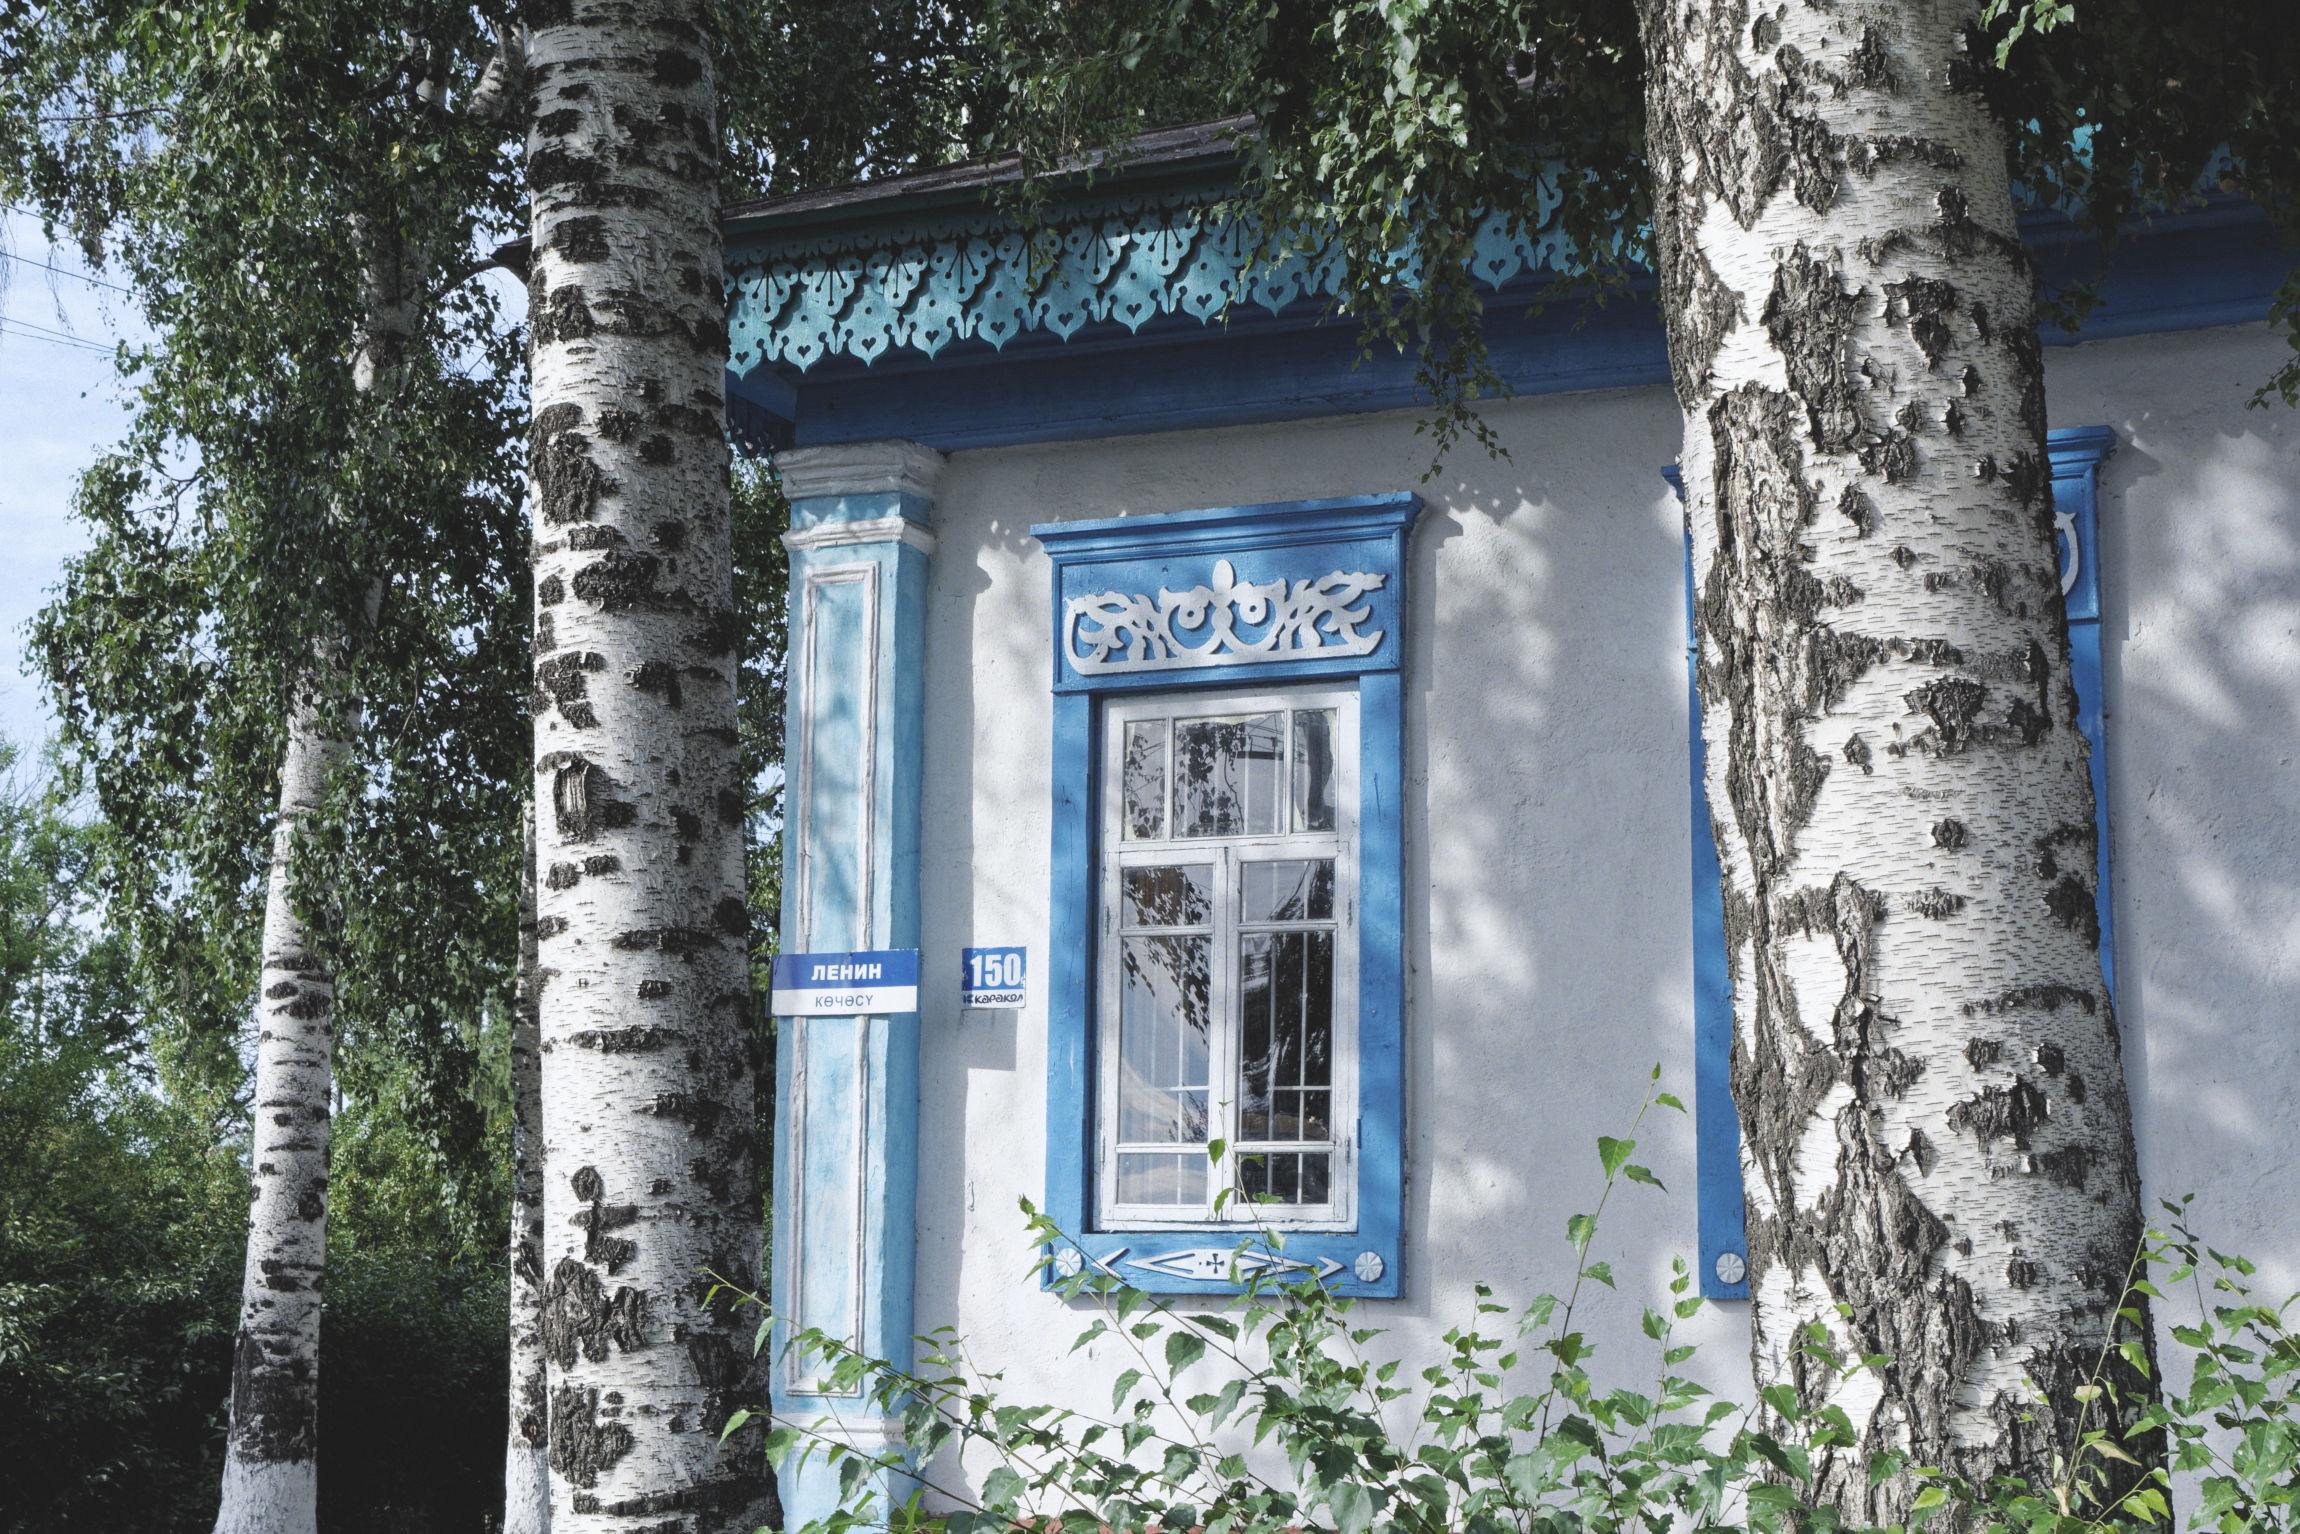 Maison russe Karakol Kirghizstan